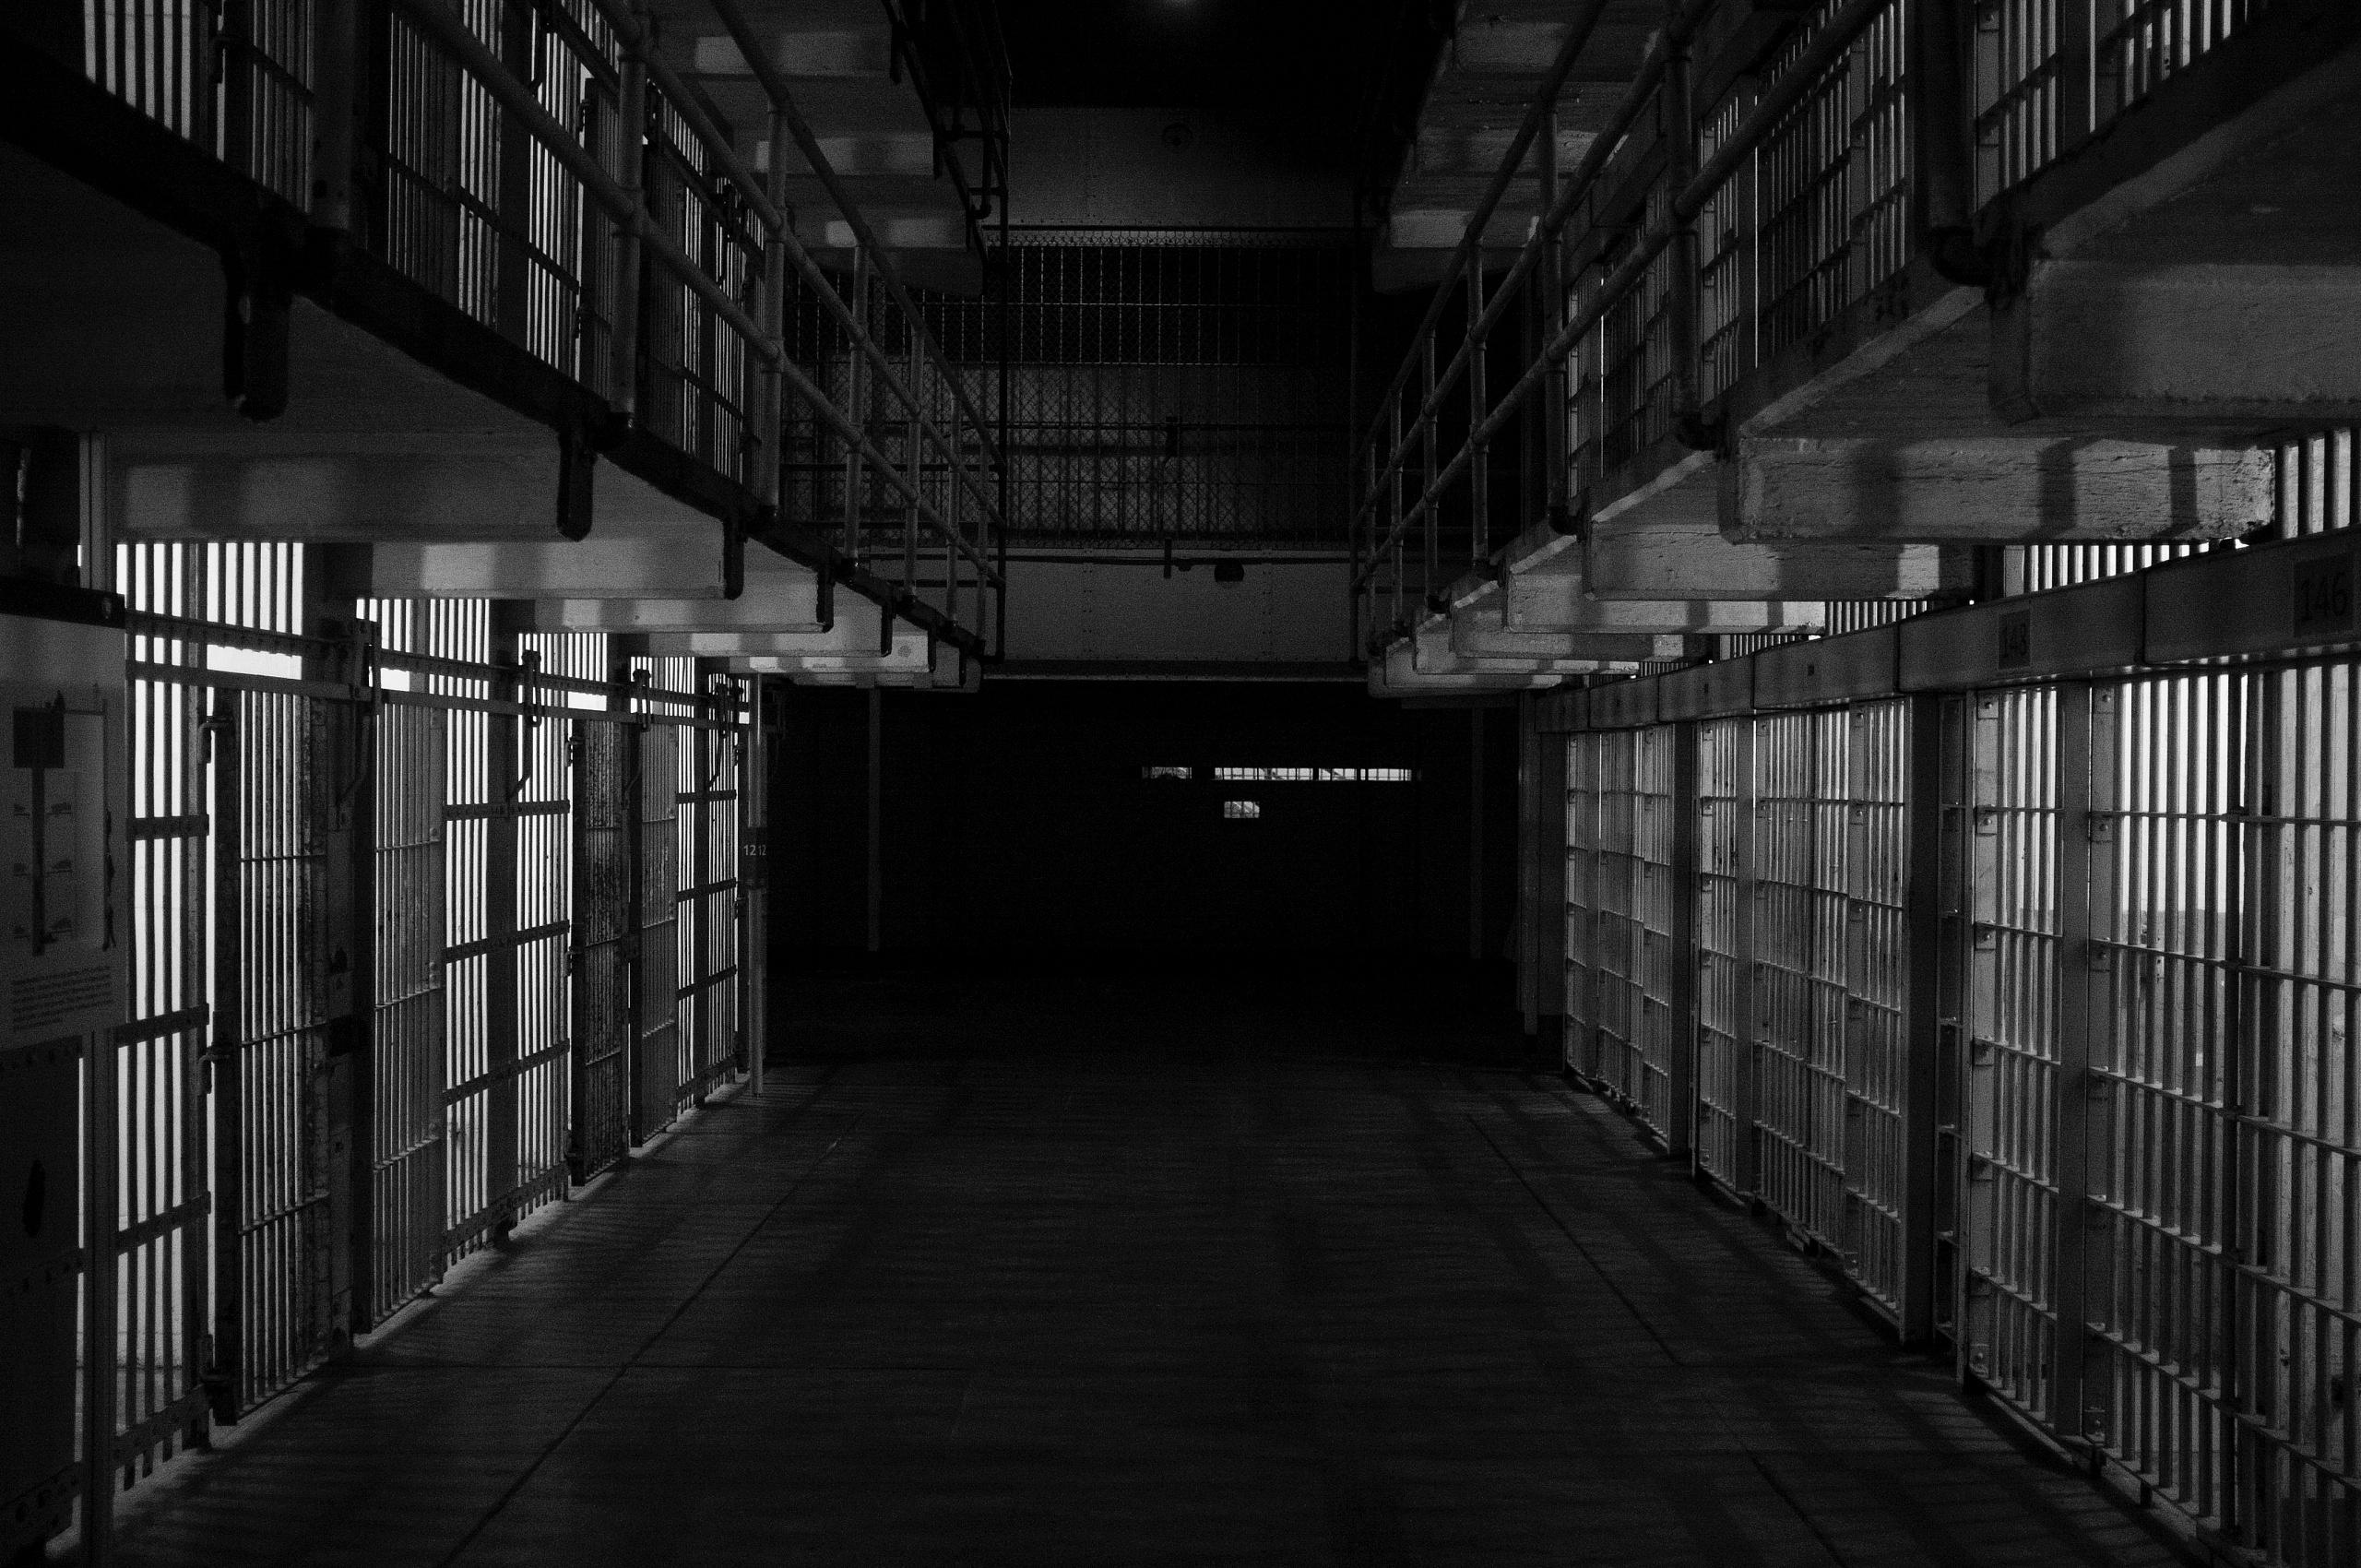 Maximale straf voor doodslag omhoog?